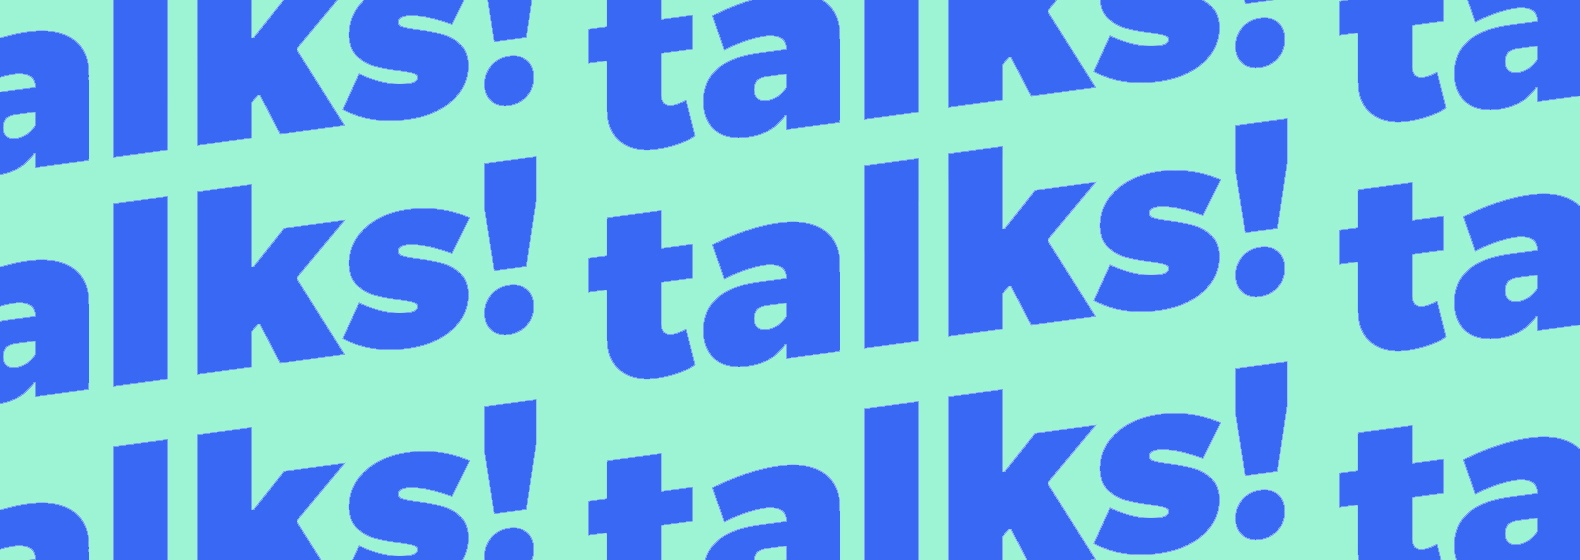 talks_ndeg2_banner_inscription.jpg